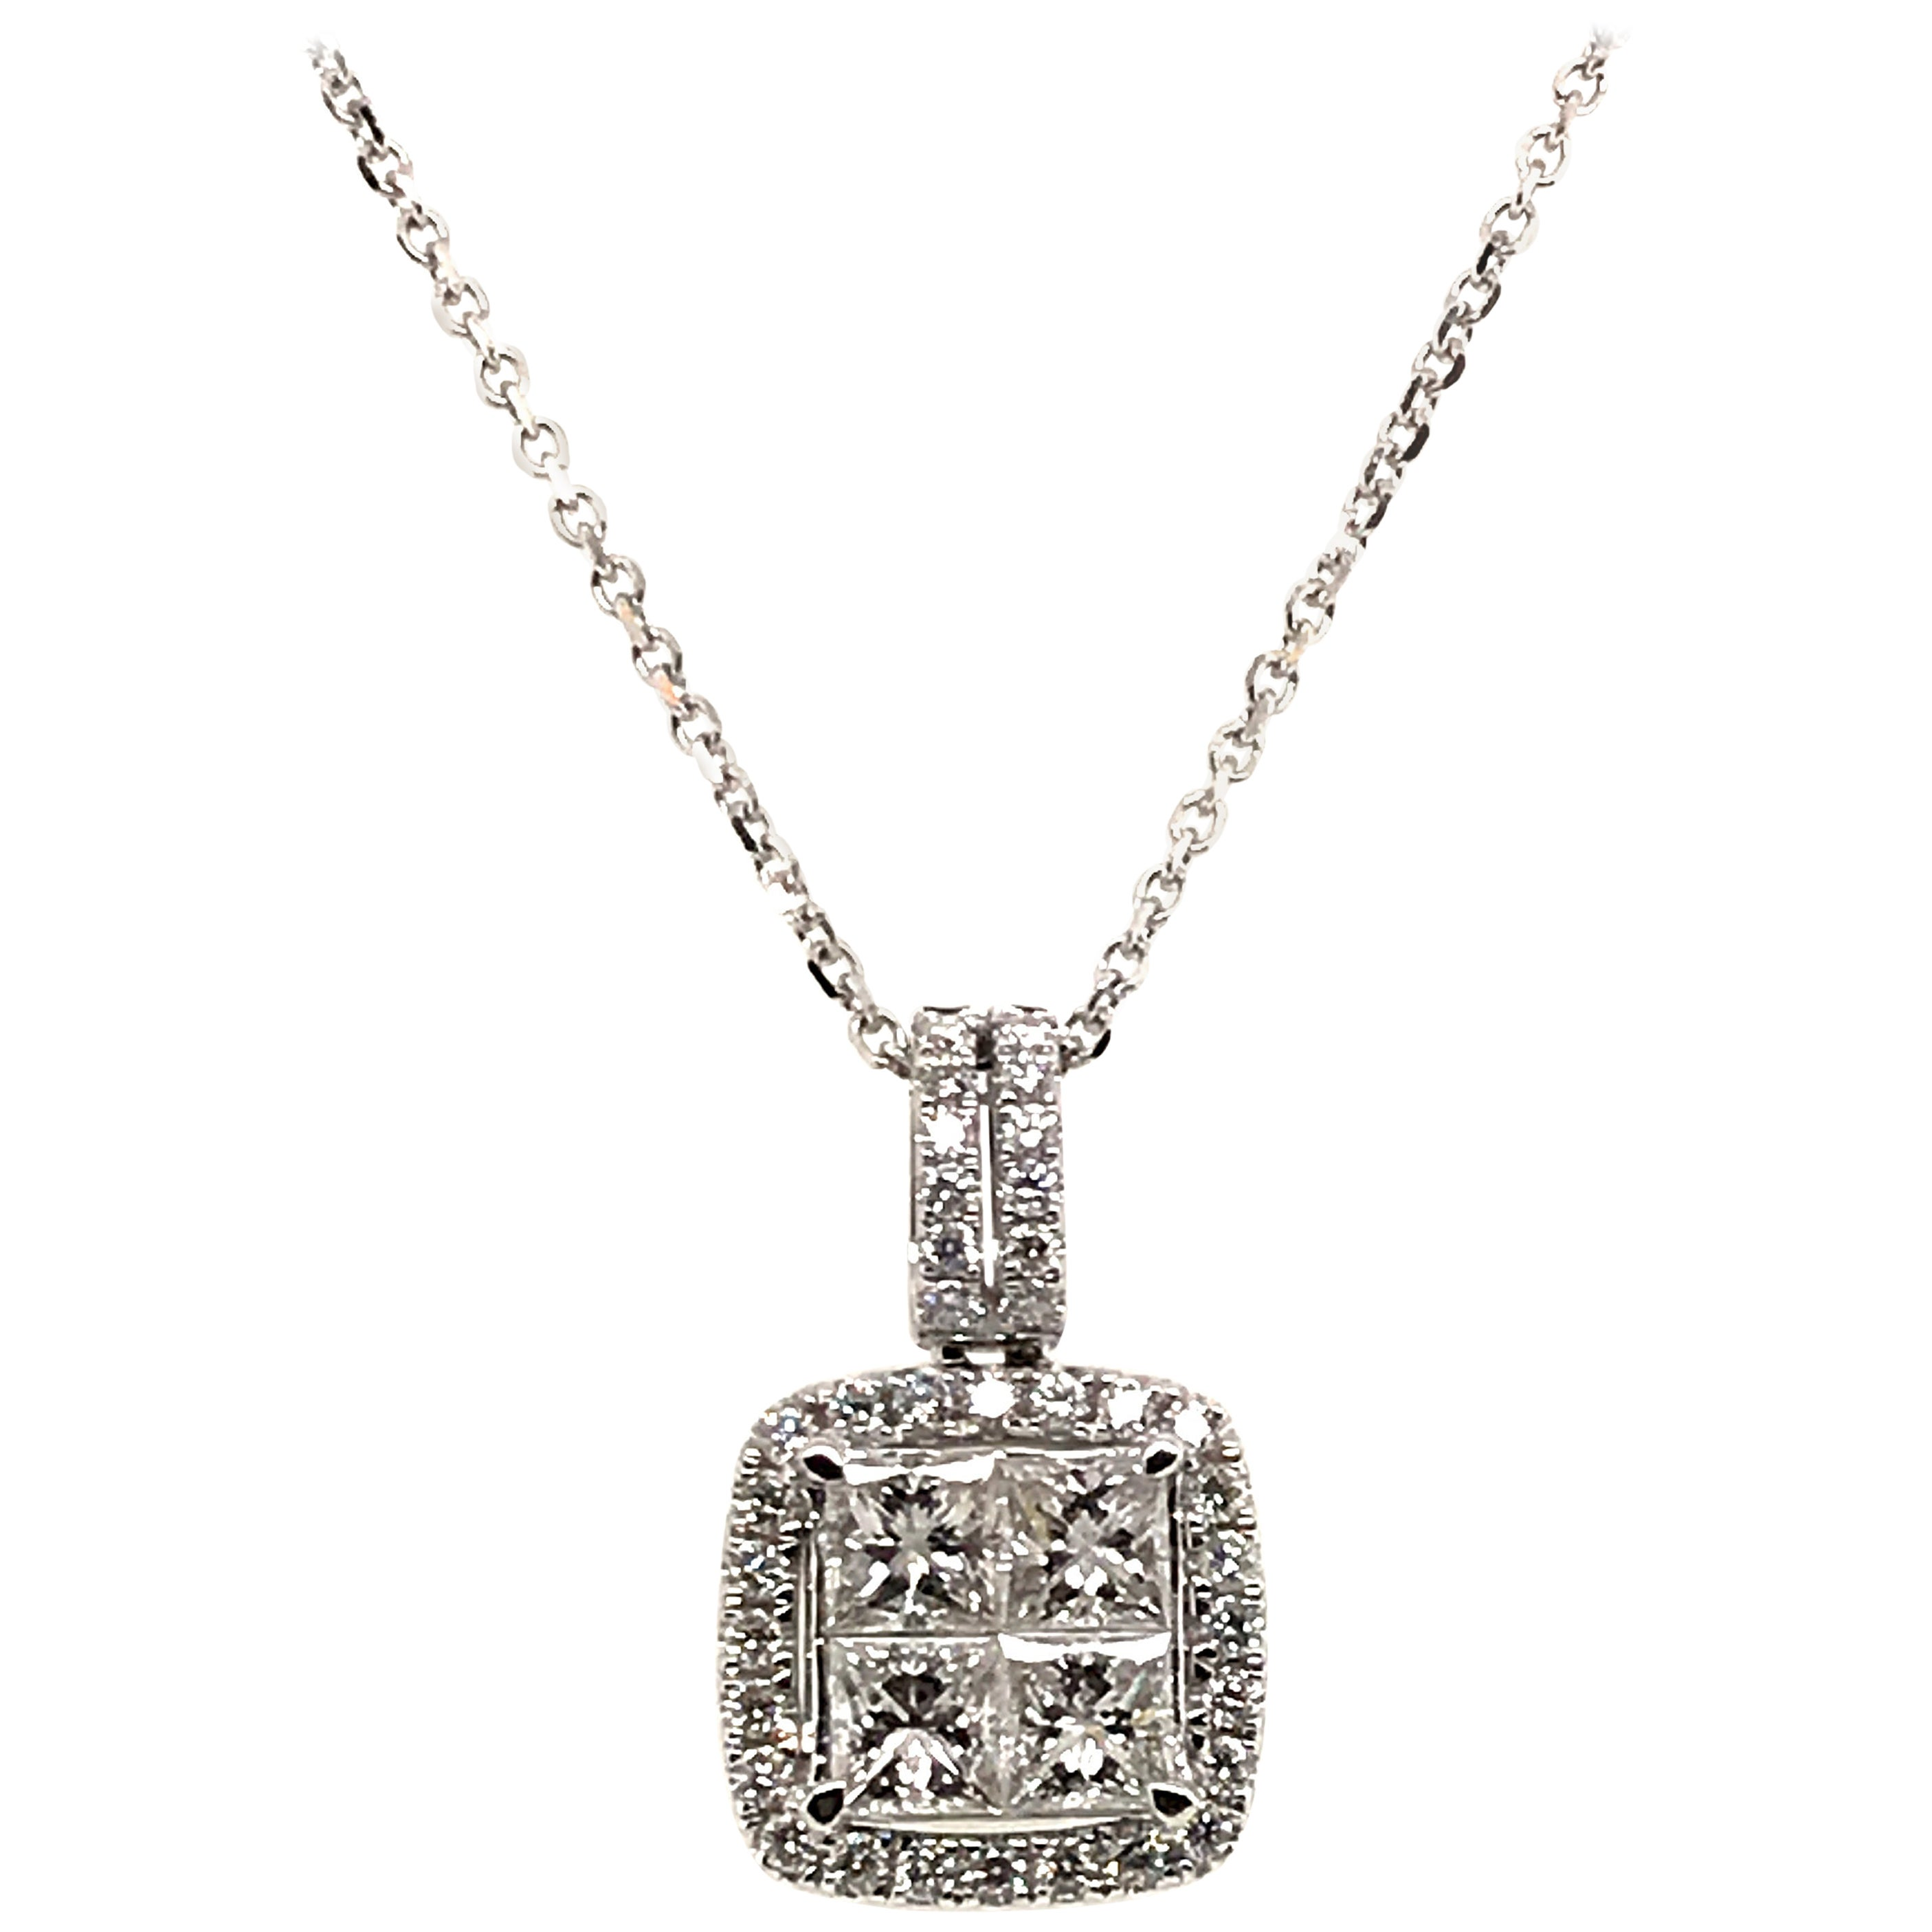 1.06 Carat Princess Cluster with Rounds Diamond Pendant